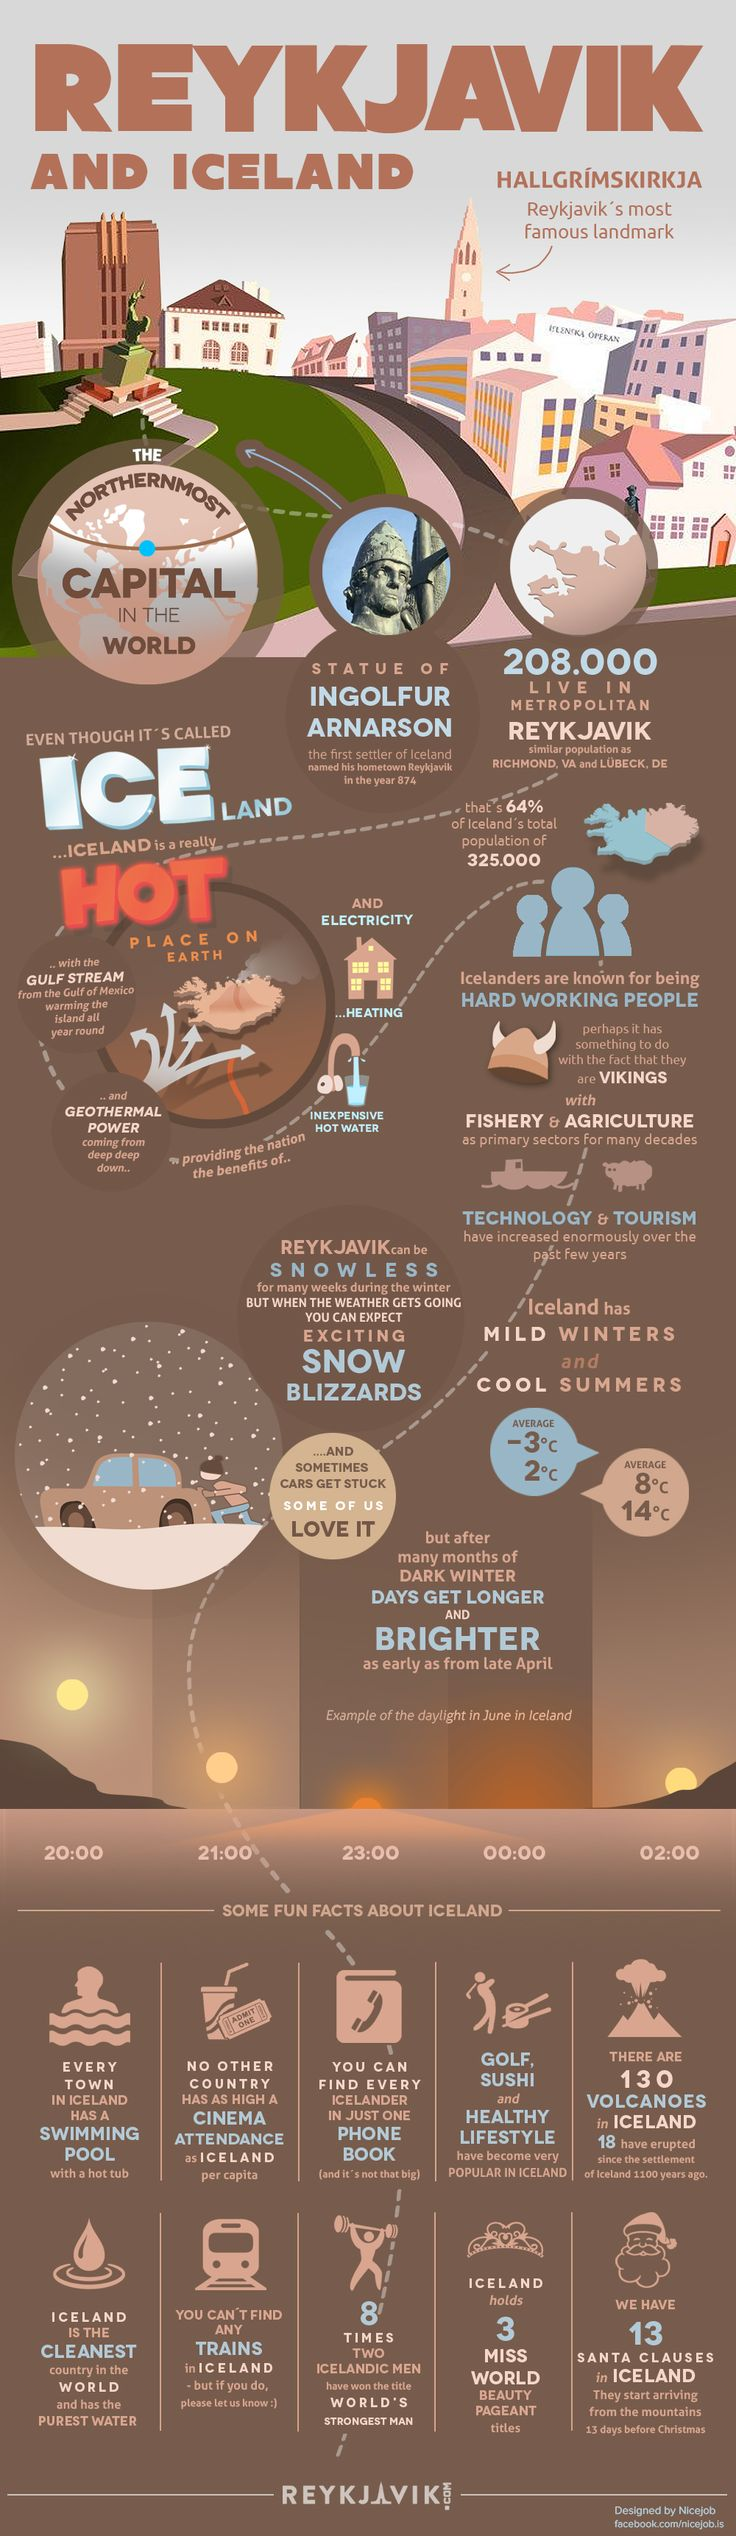 I've been there and I want to go back! It's so amazing! Brilliant Infograph on Reykjavik & Iceland